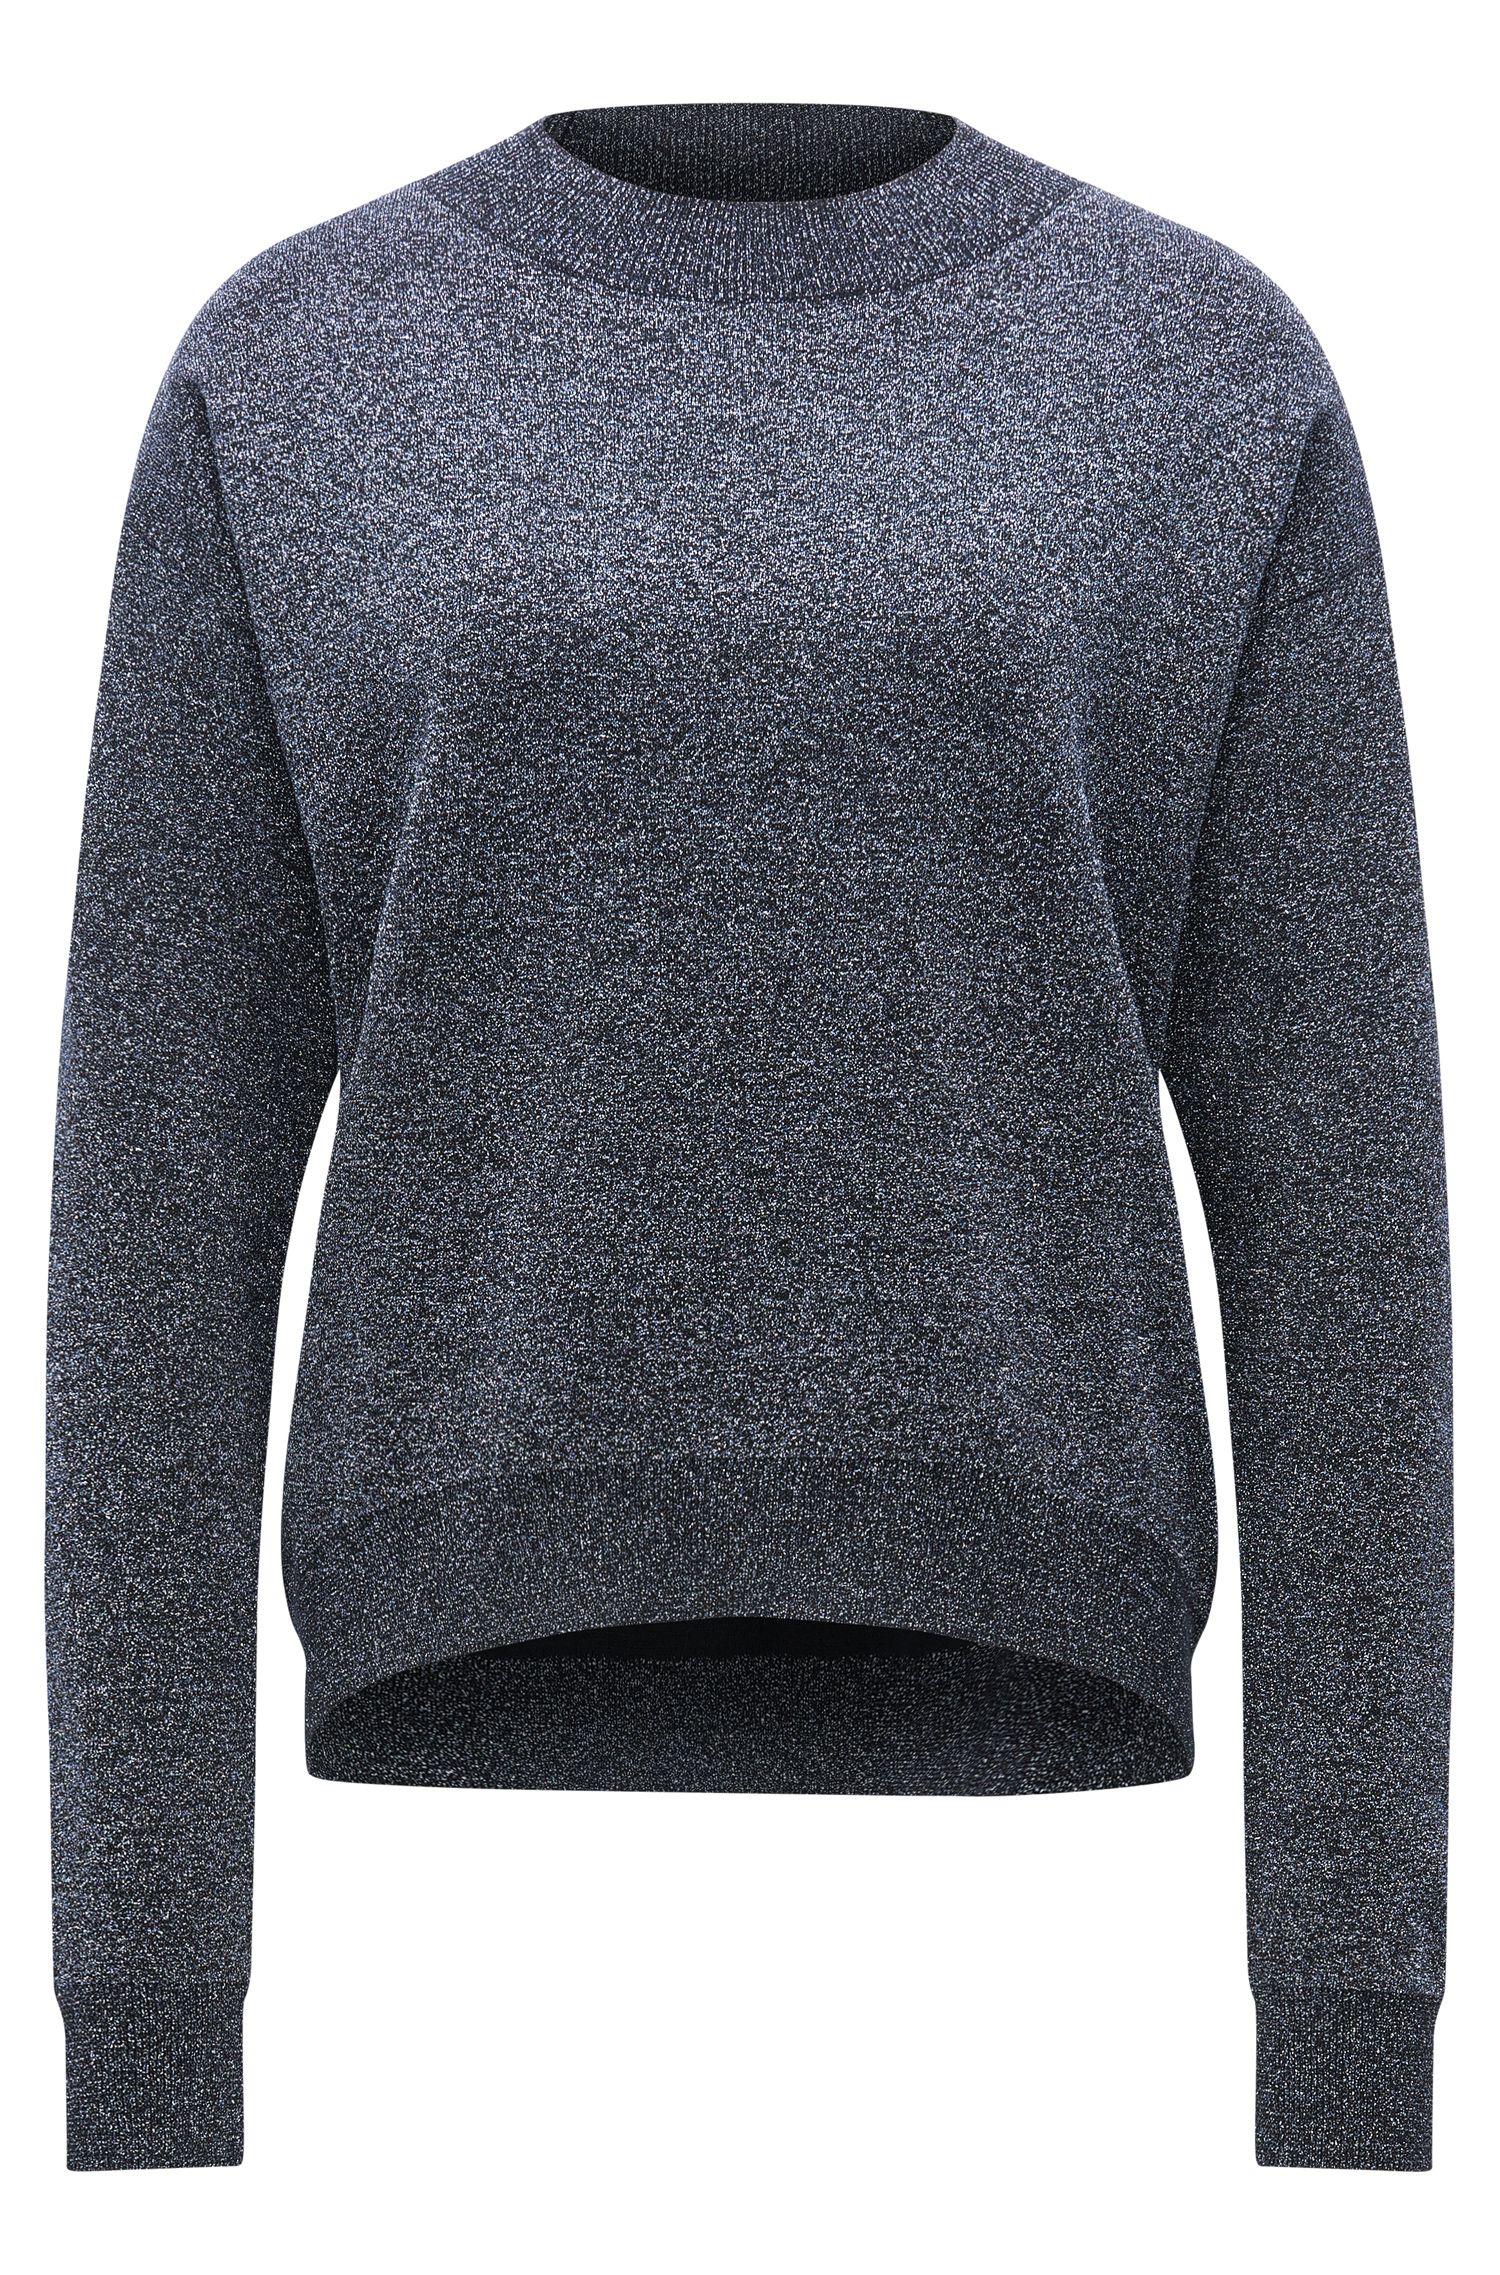 Matallicized Virgin Wool Sweater | Funday